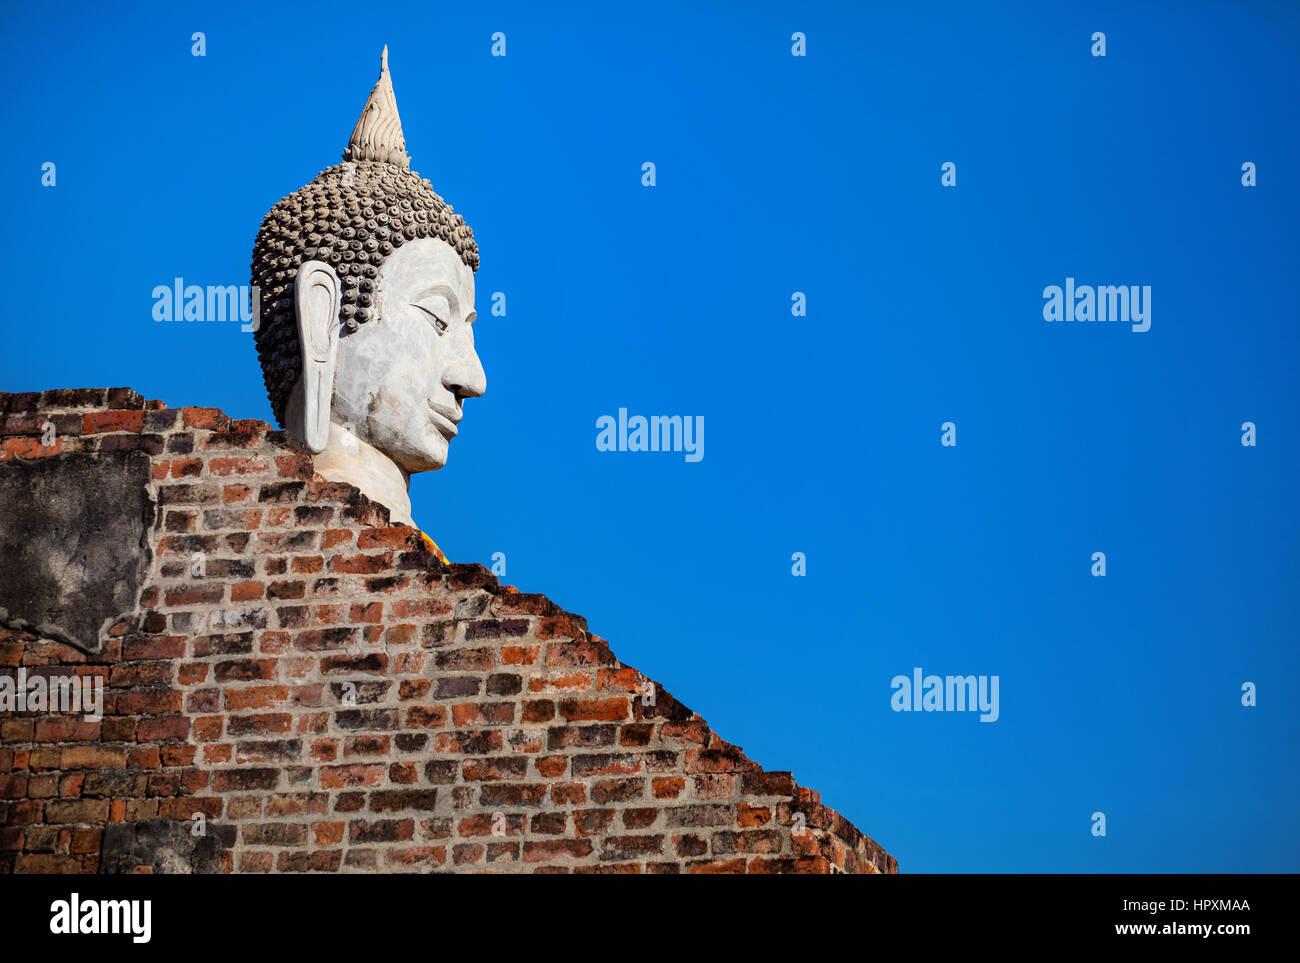 Grande statua del Buddha in Wat Yai Chai Mongkol monastero a cielo blu in Ayuttaya, Thailandia Immagini Stock